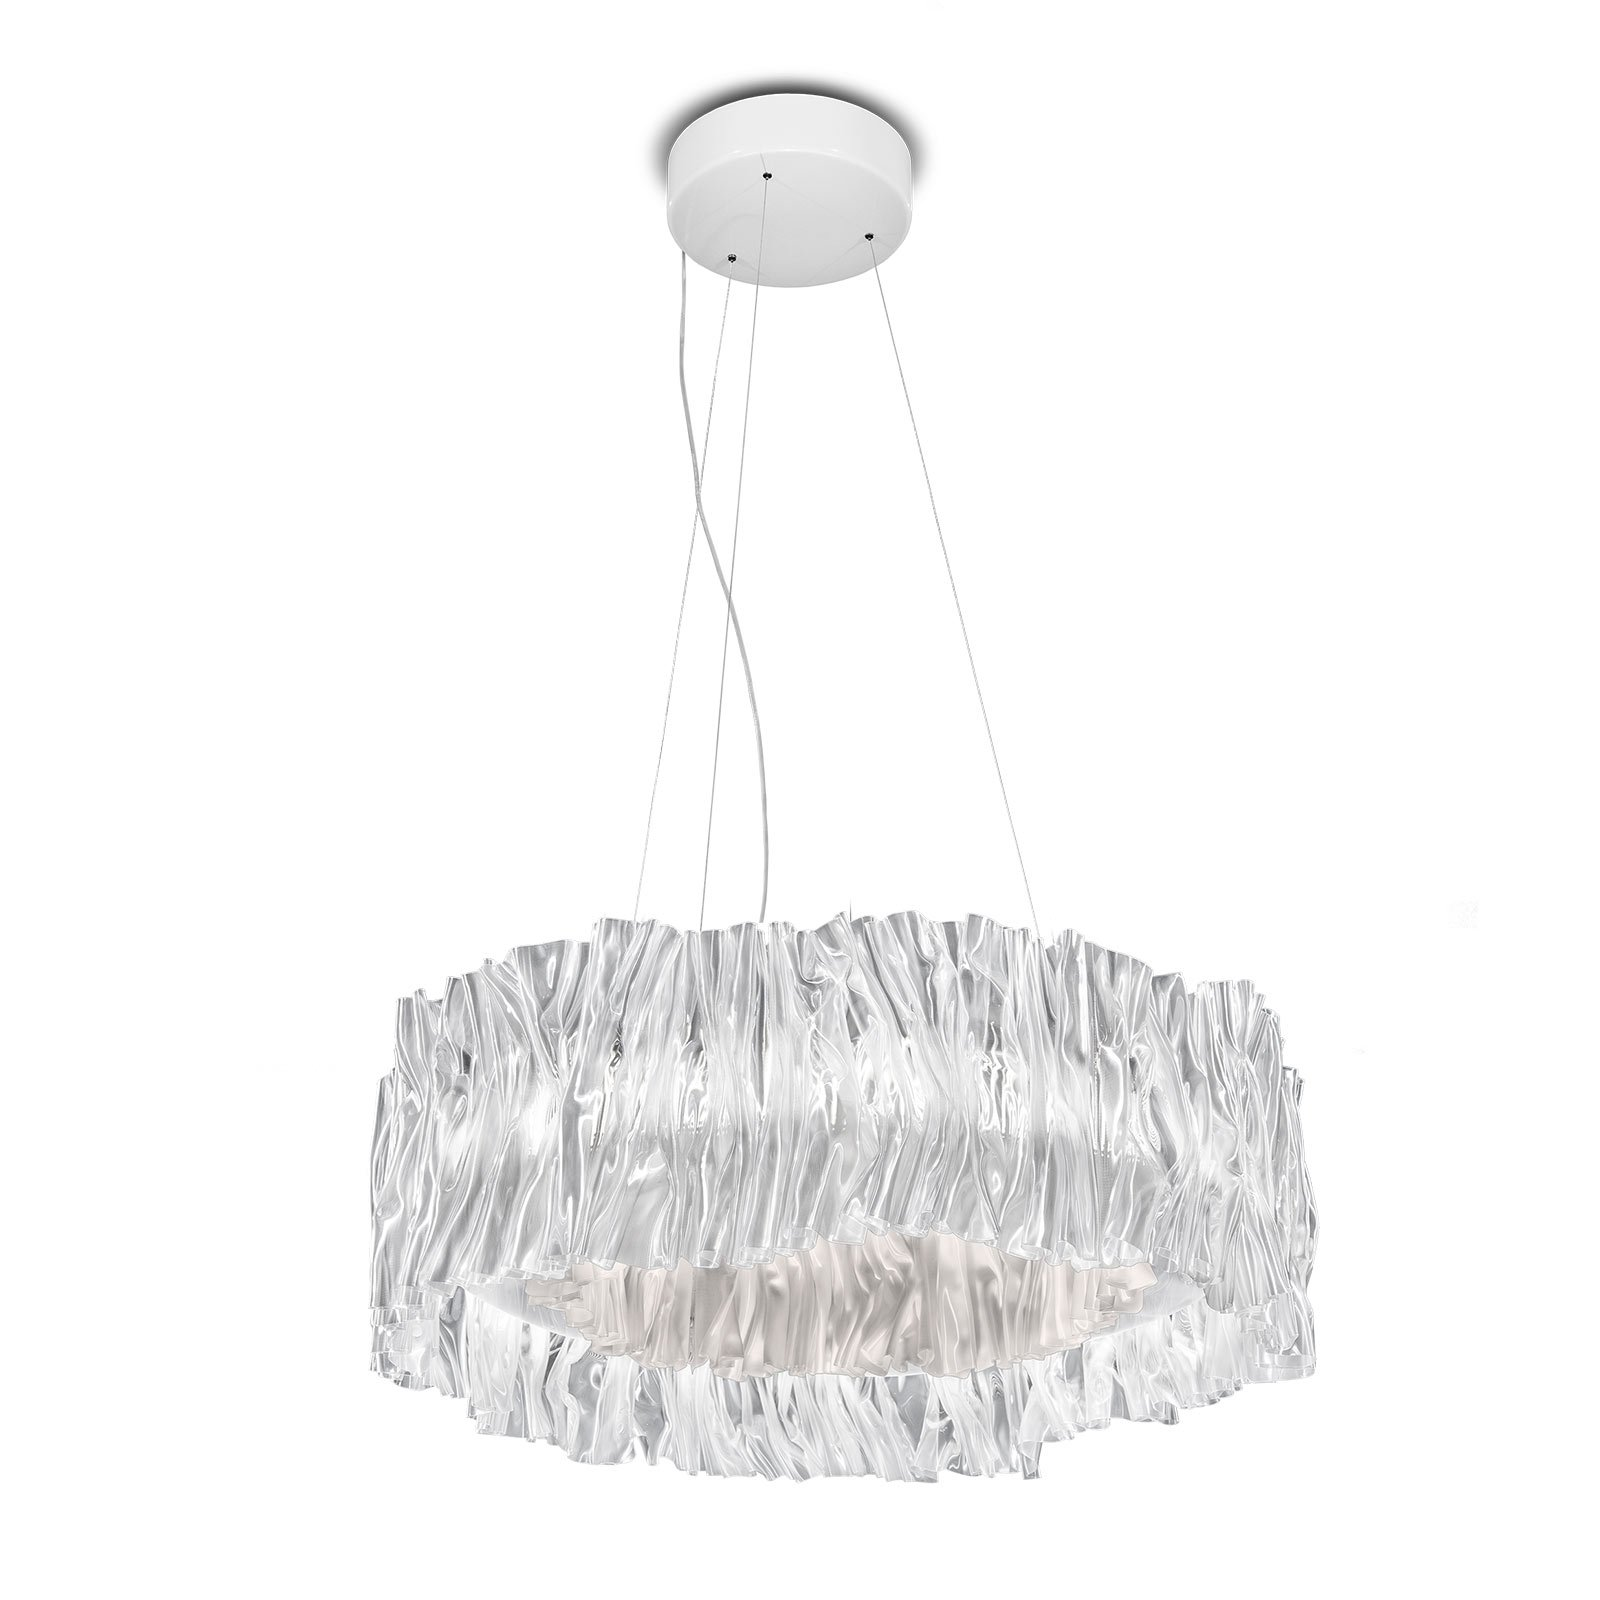 Slamp Accordéon LED-hengelampe hvit 2 700 K